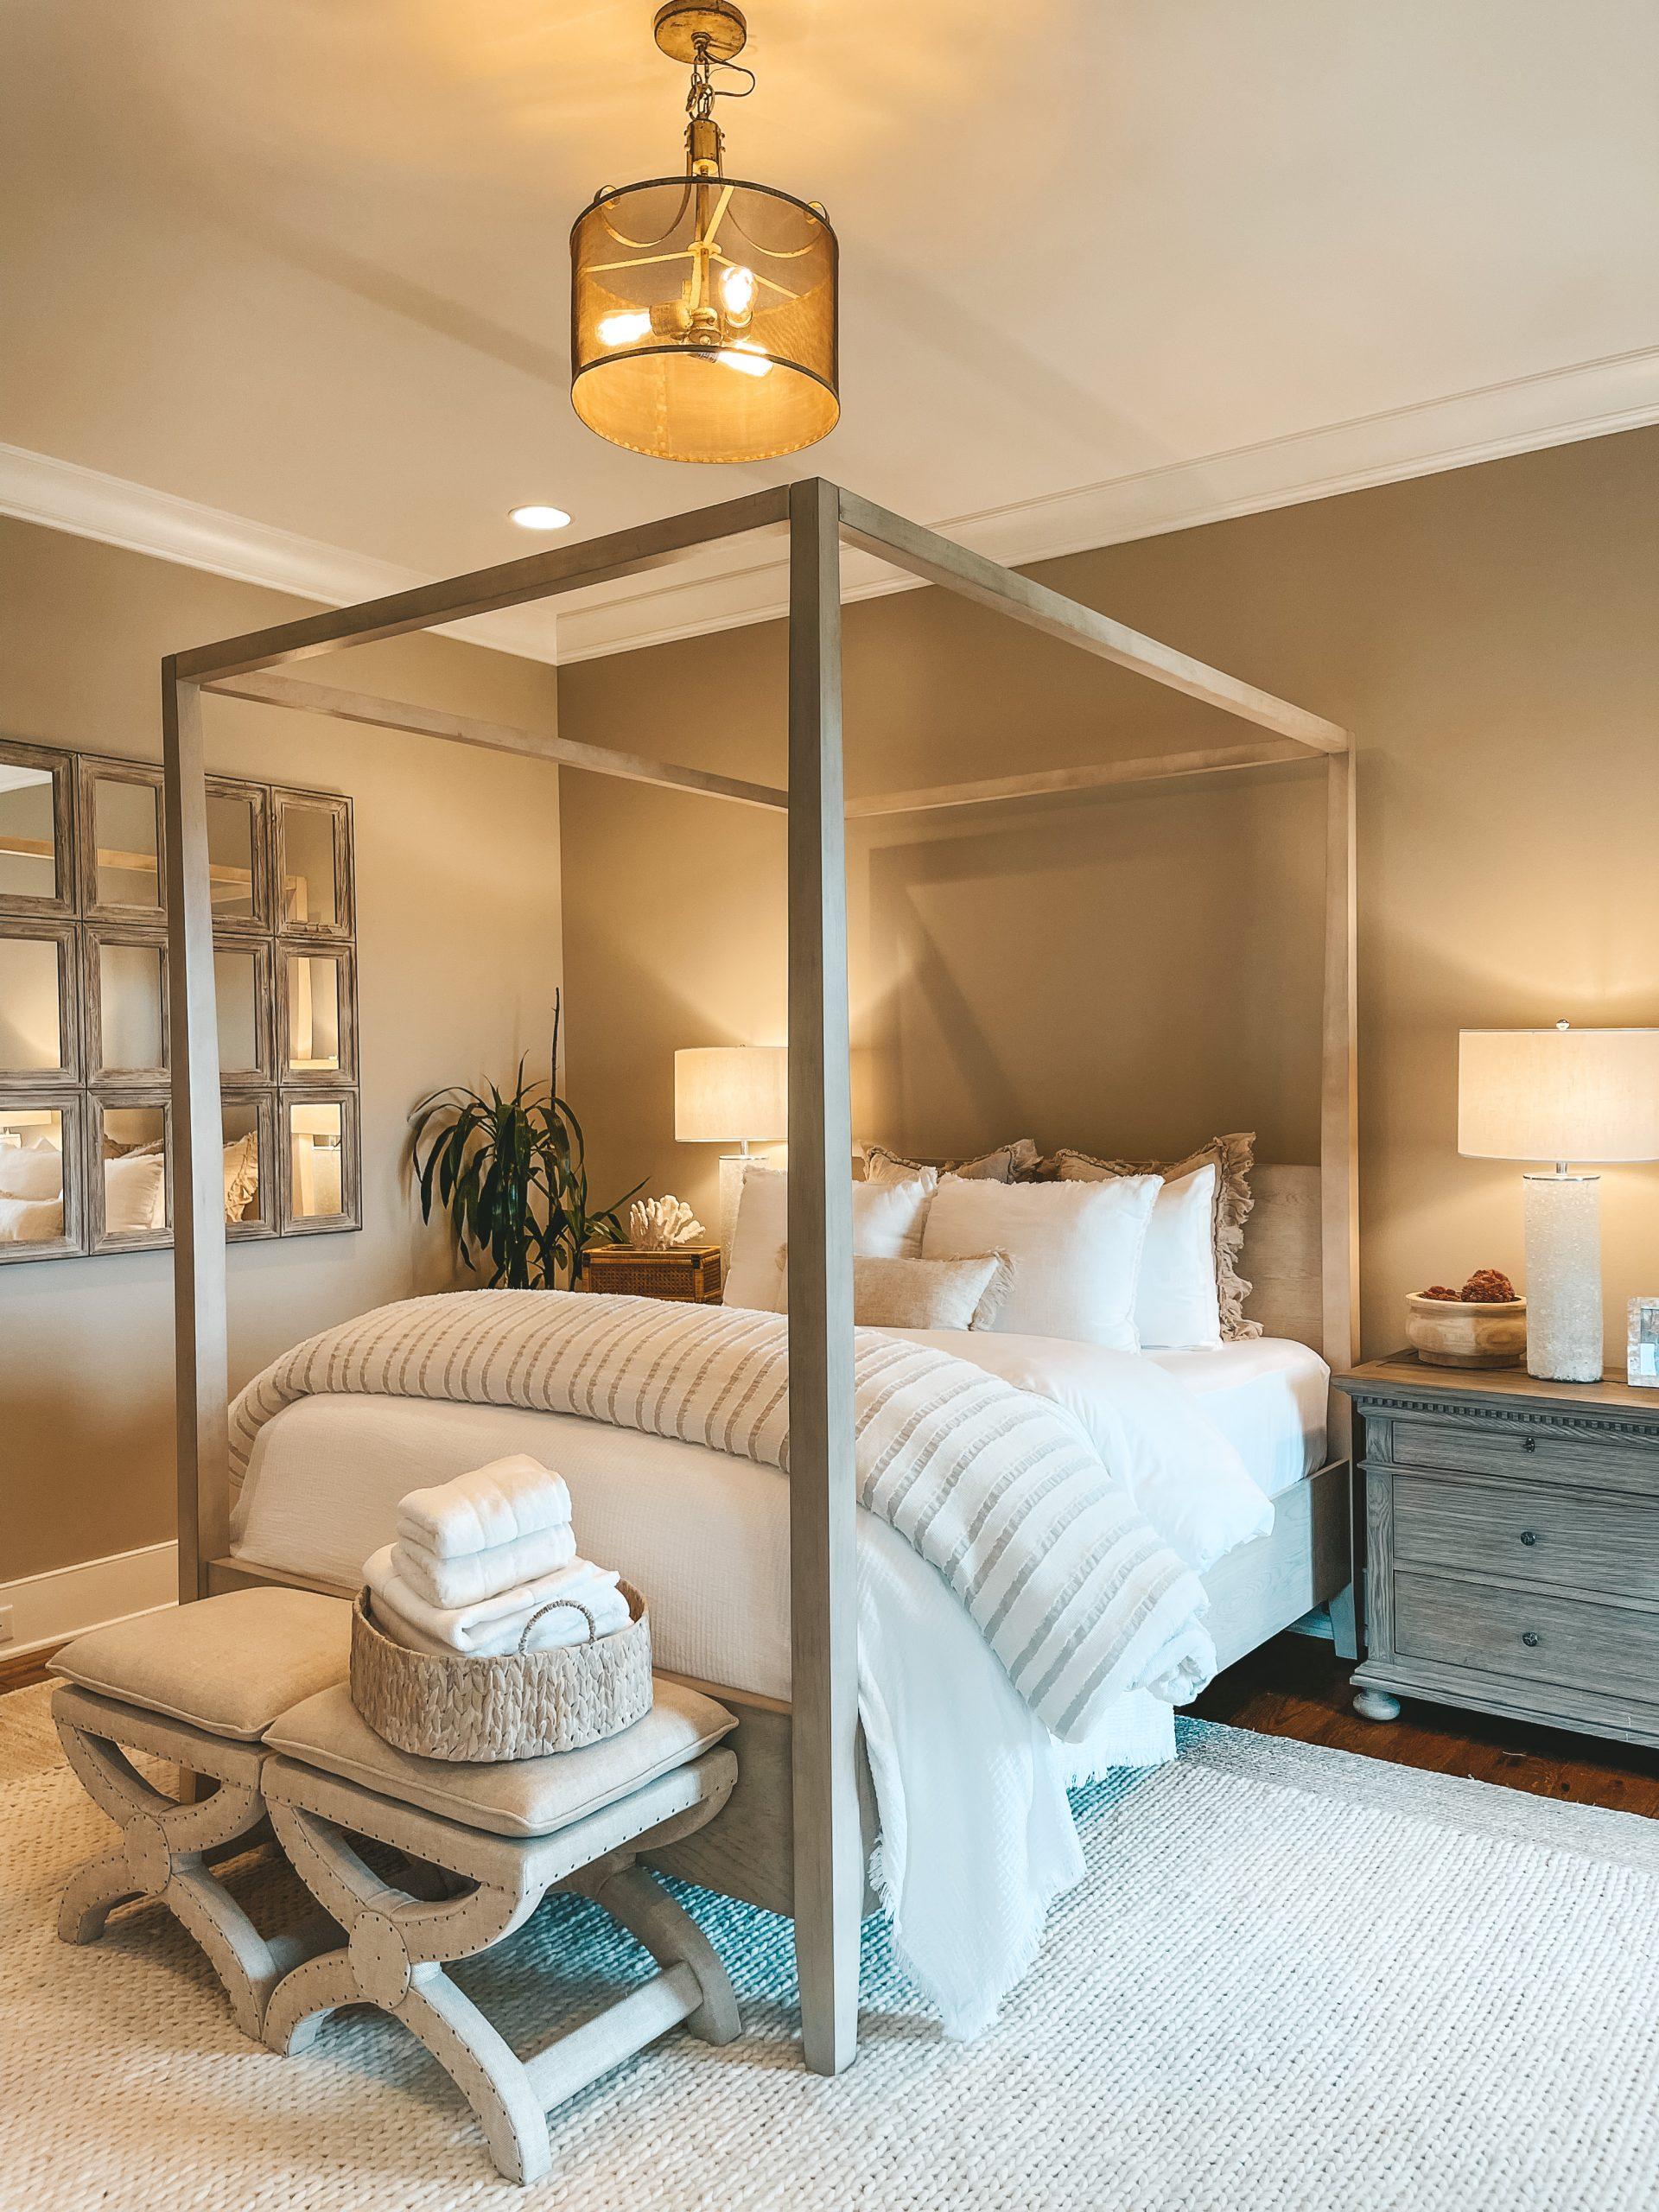 Rugs USA Off White Braided Area Rug Guest bedroom neutral coastal decor nashville home angela lanter